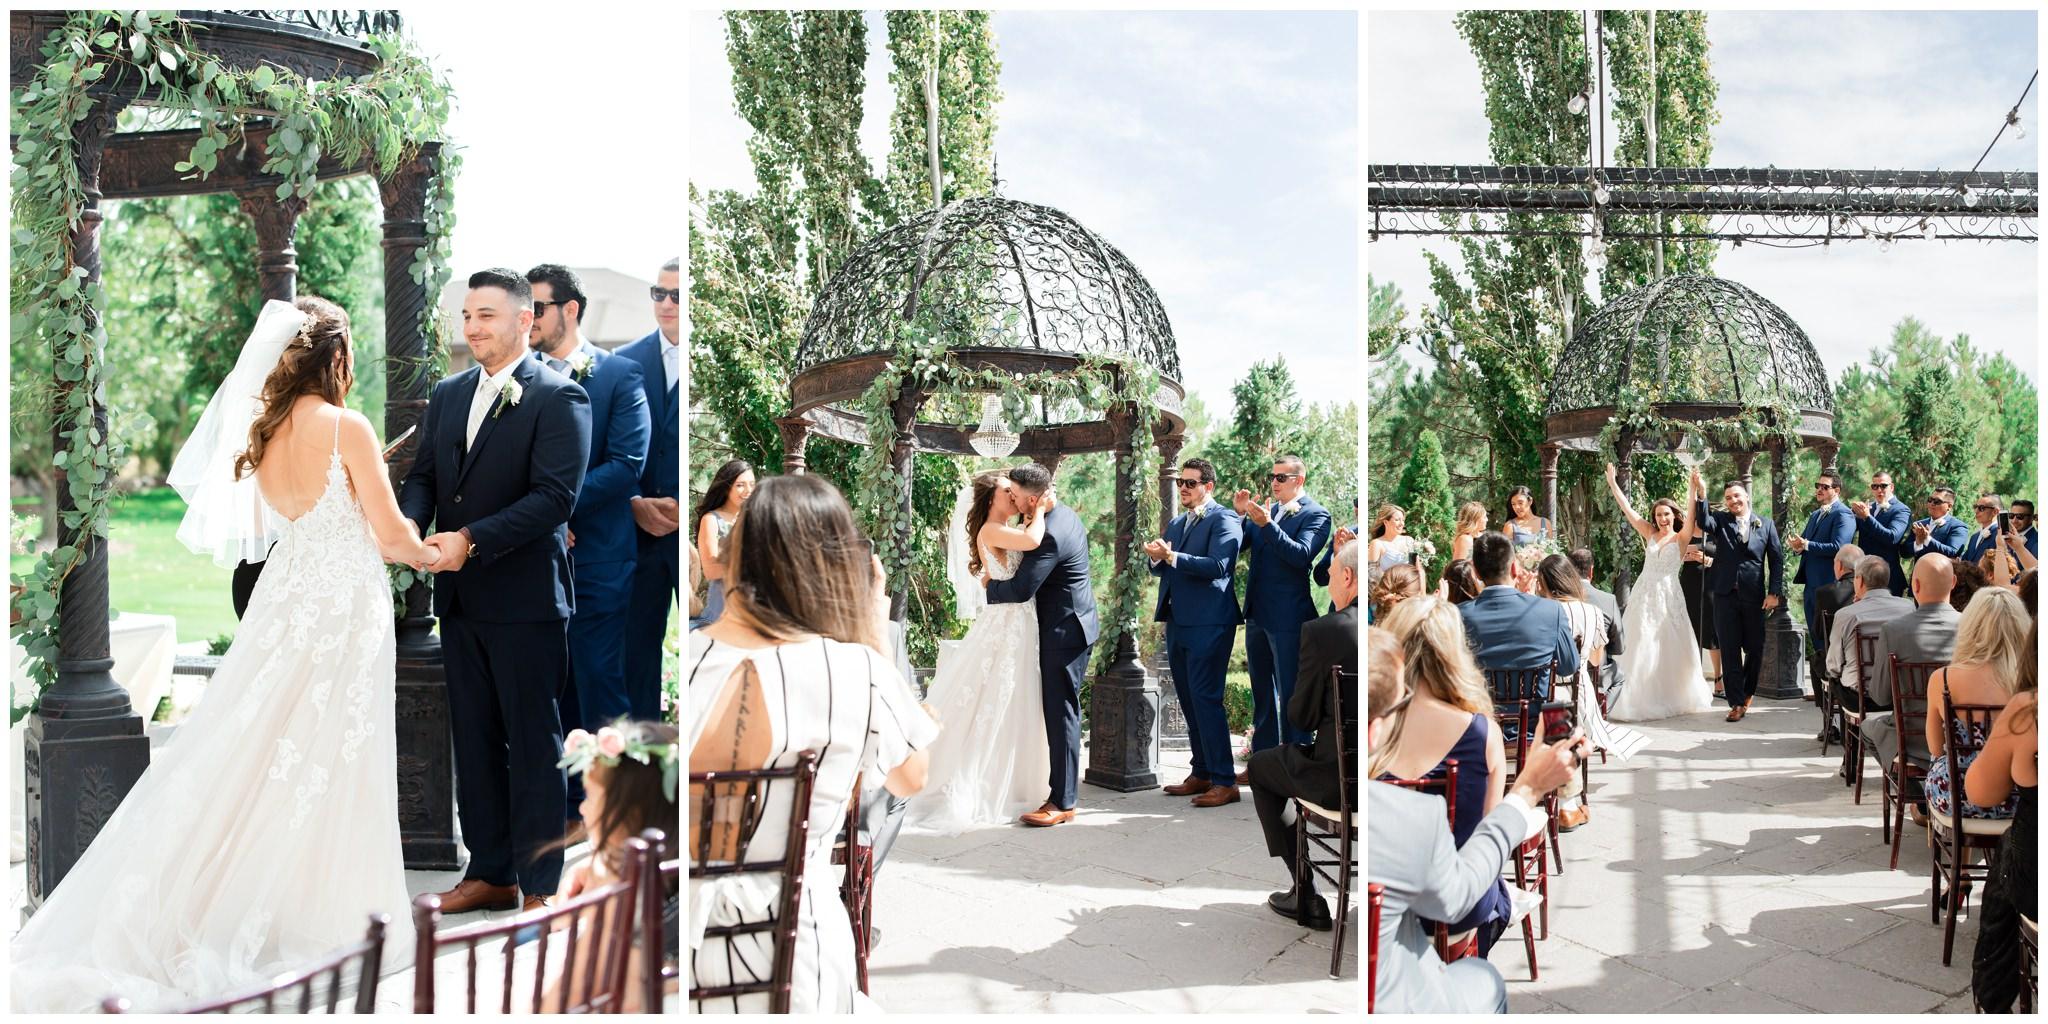 Wedding Ceremony outside of the Garden Room at Sleepy Ridge